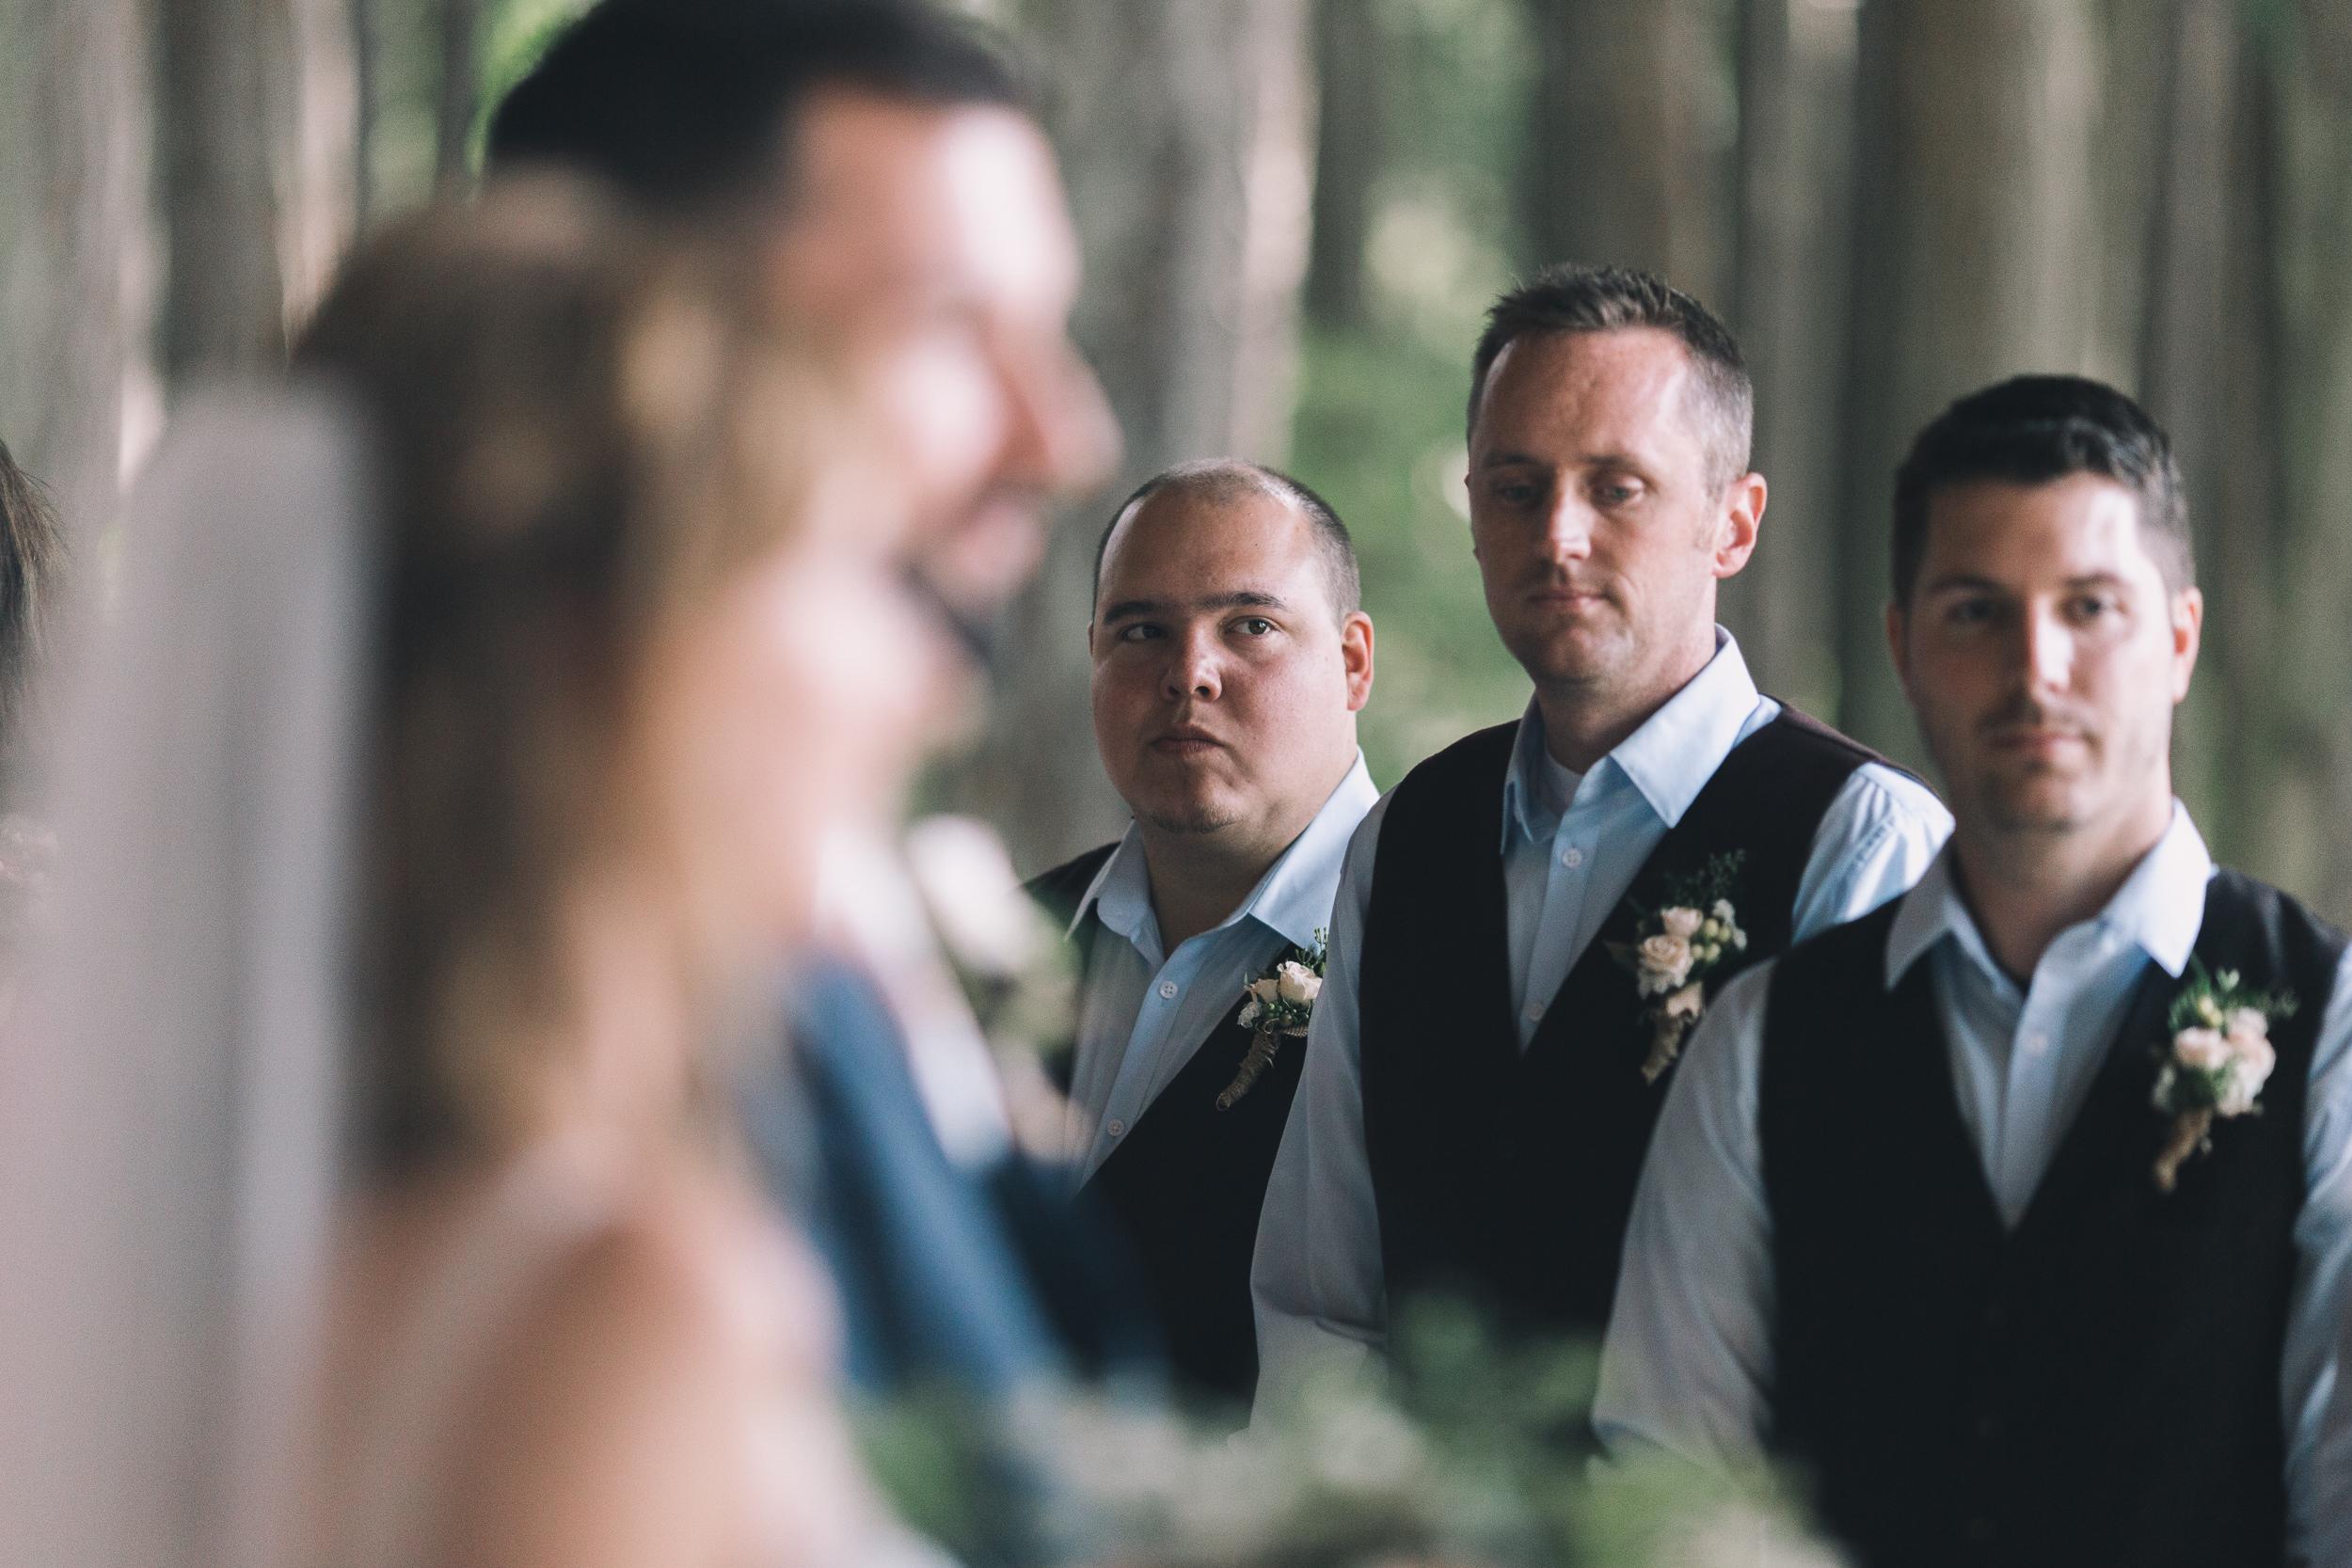 kitsap memorial state park grooms men look at groom